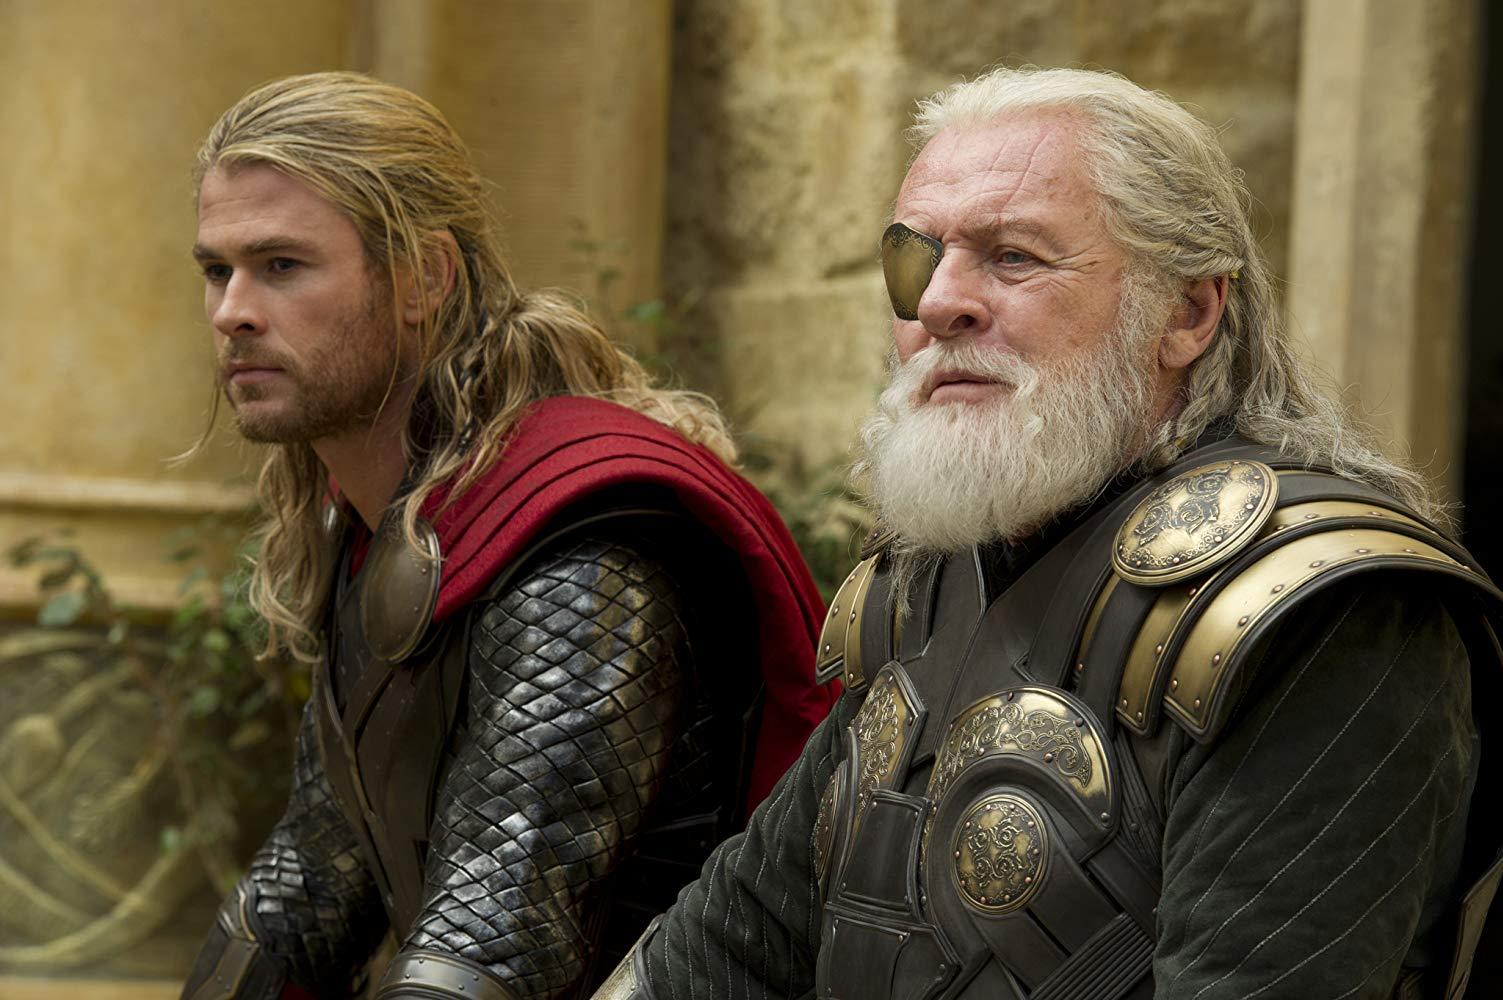 How To Watch Thor The Dark World